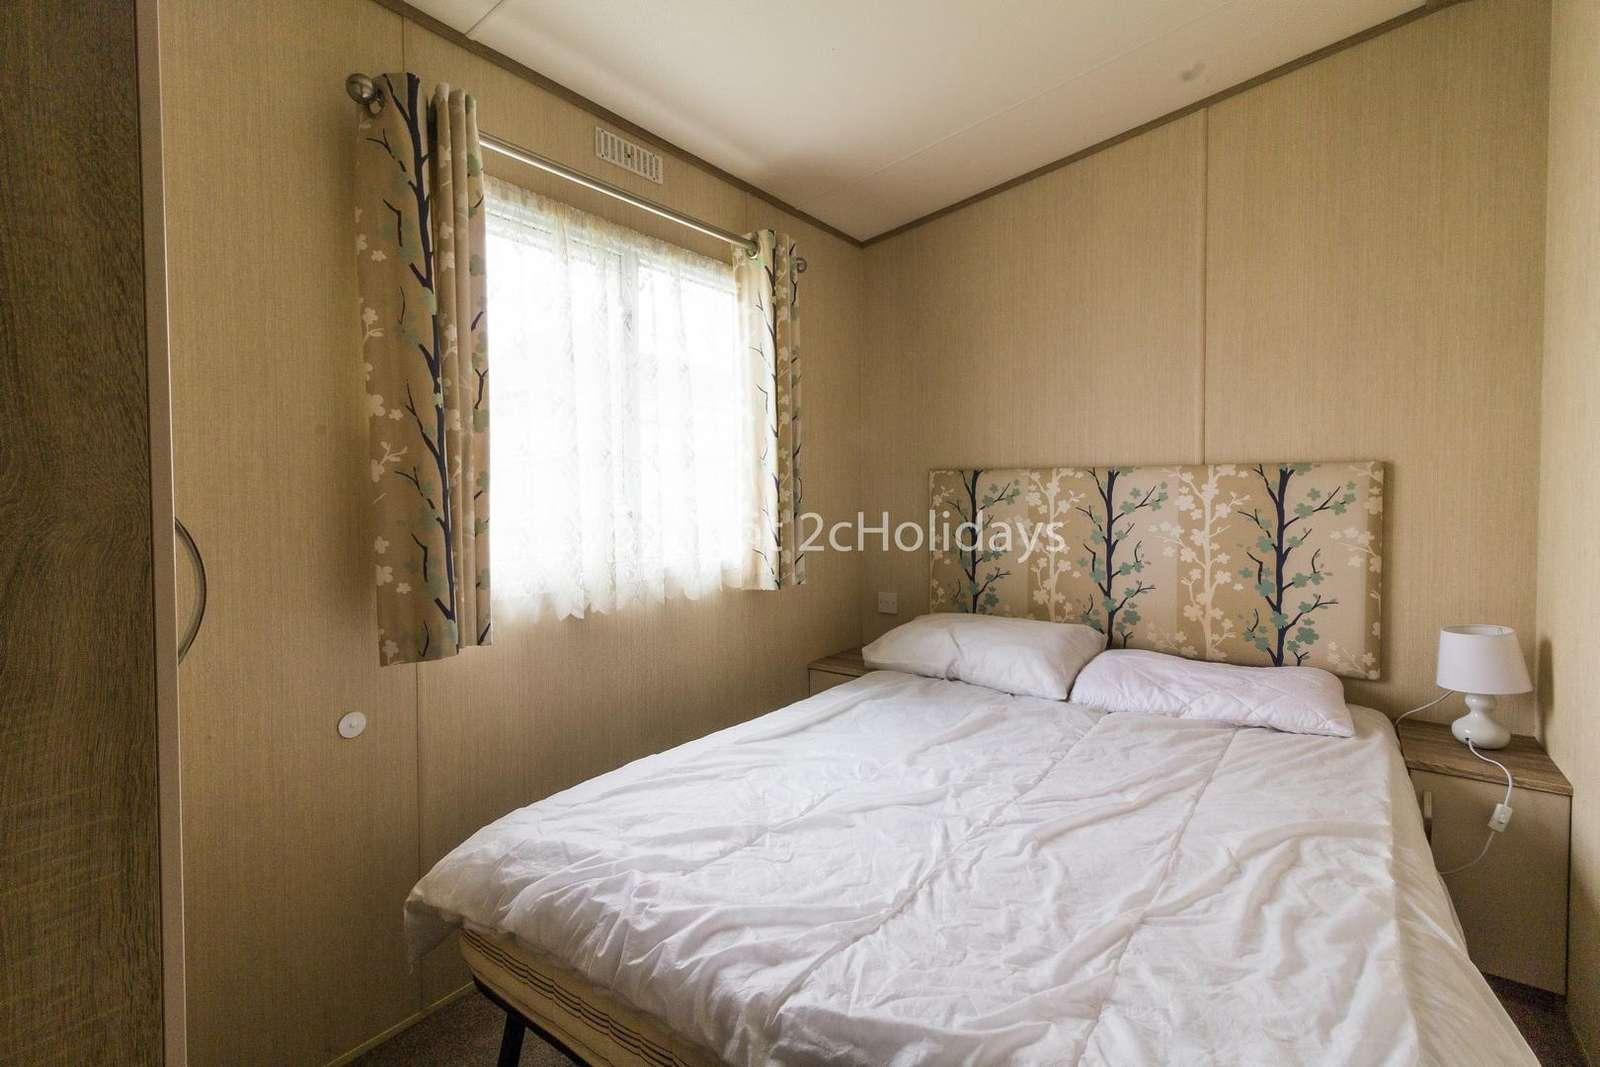 Great size master bedroom with plenty of storage